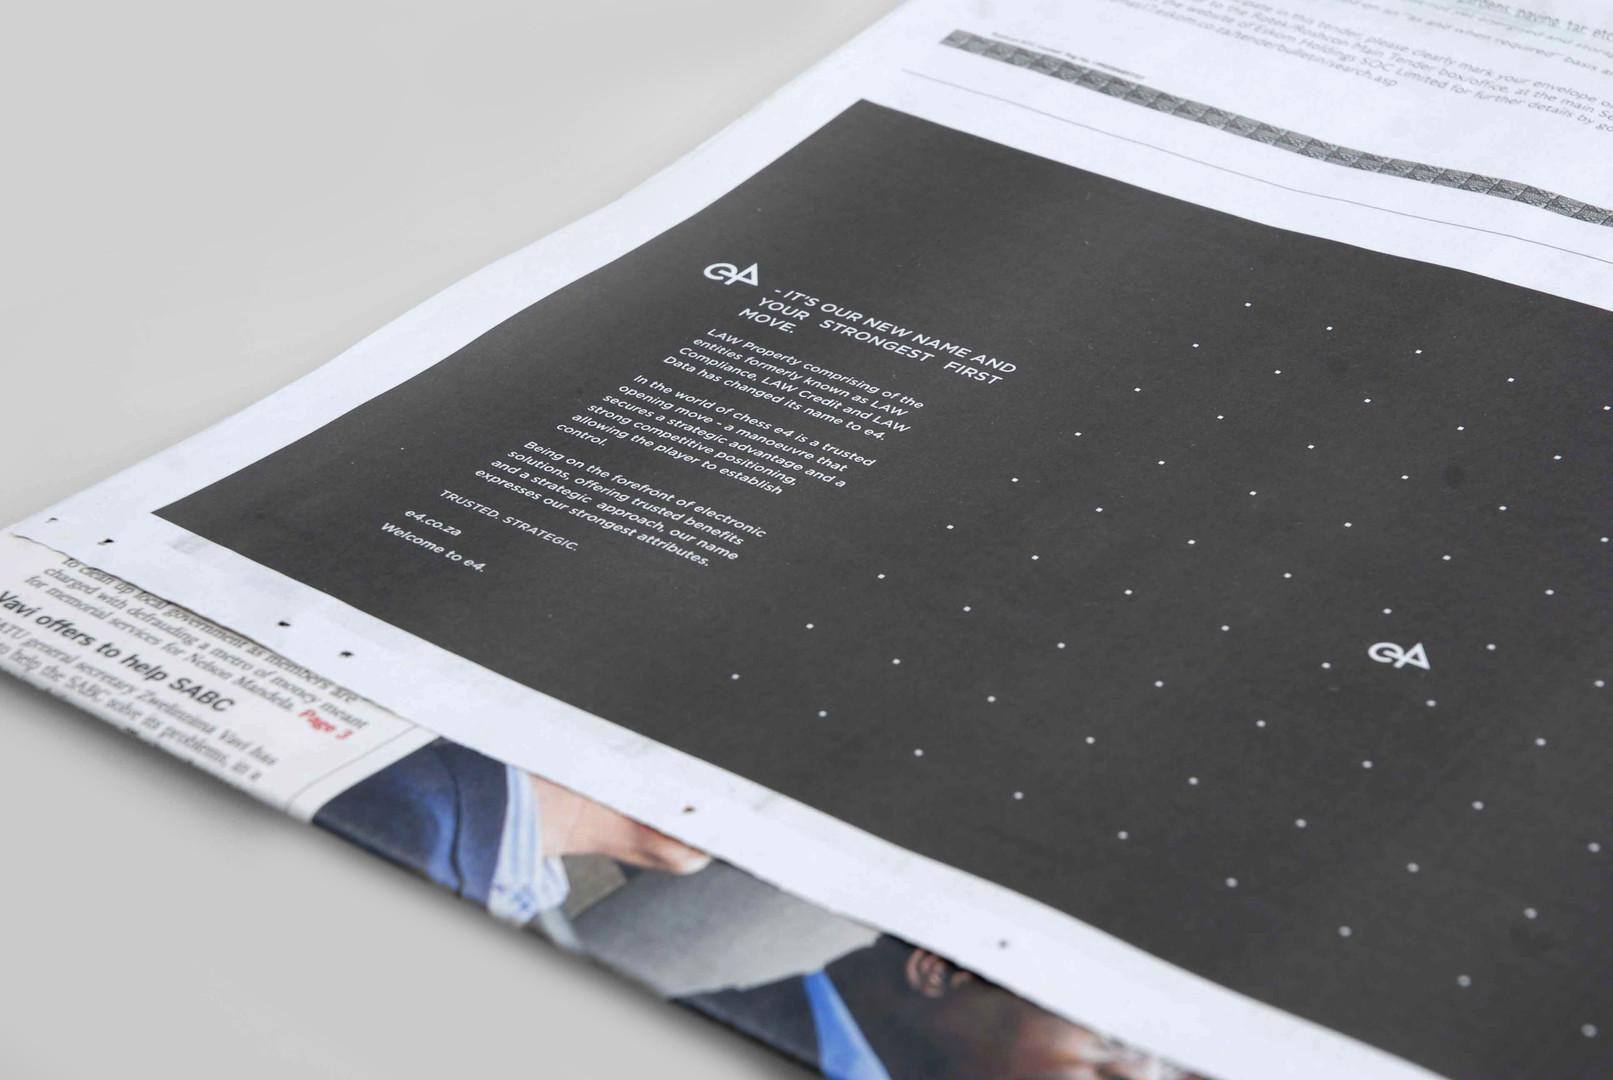 E4_newspaper copy.jpg